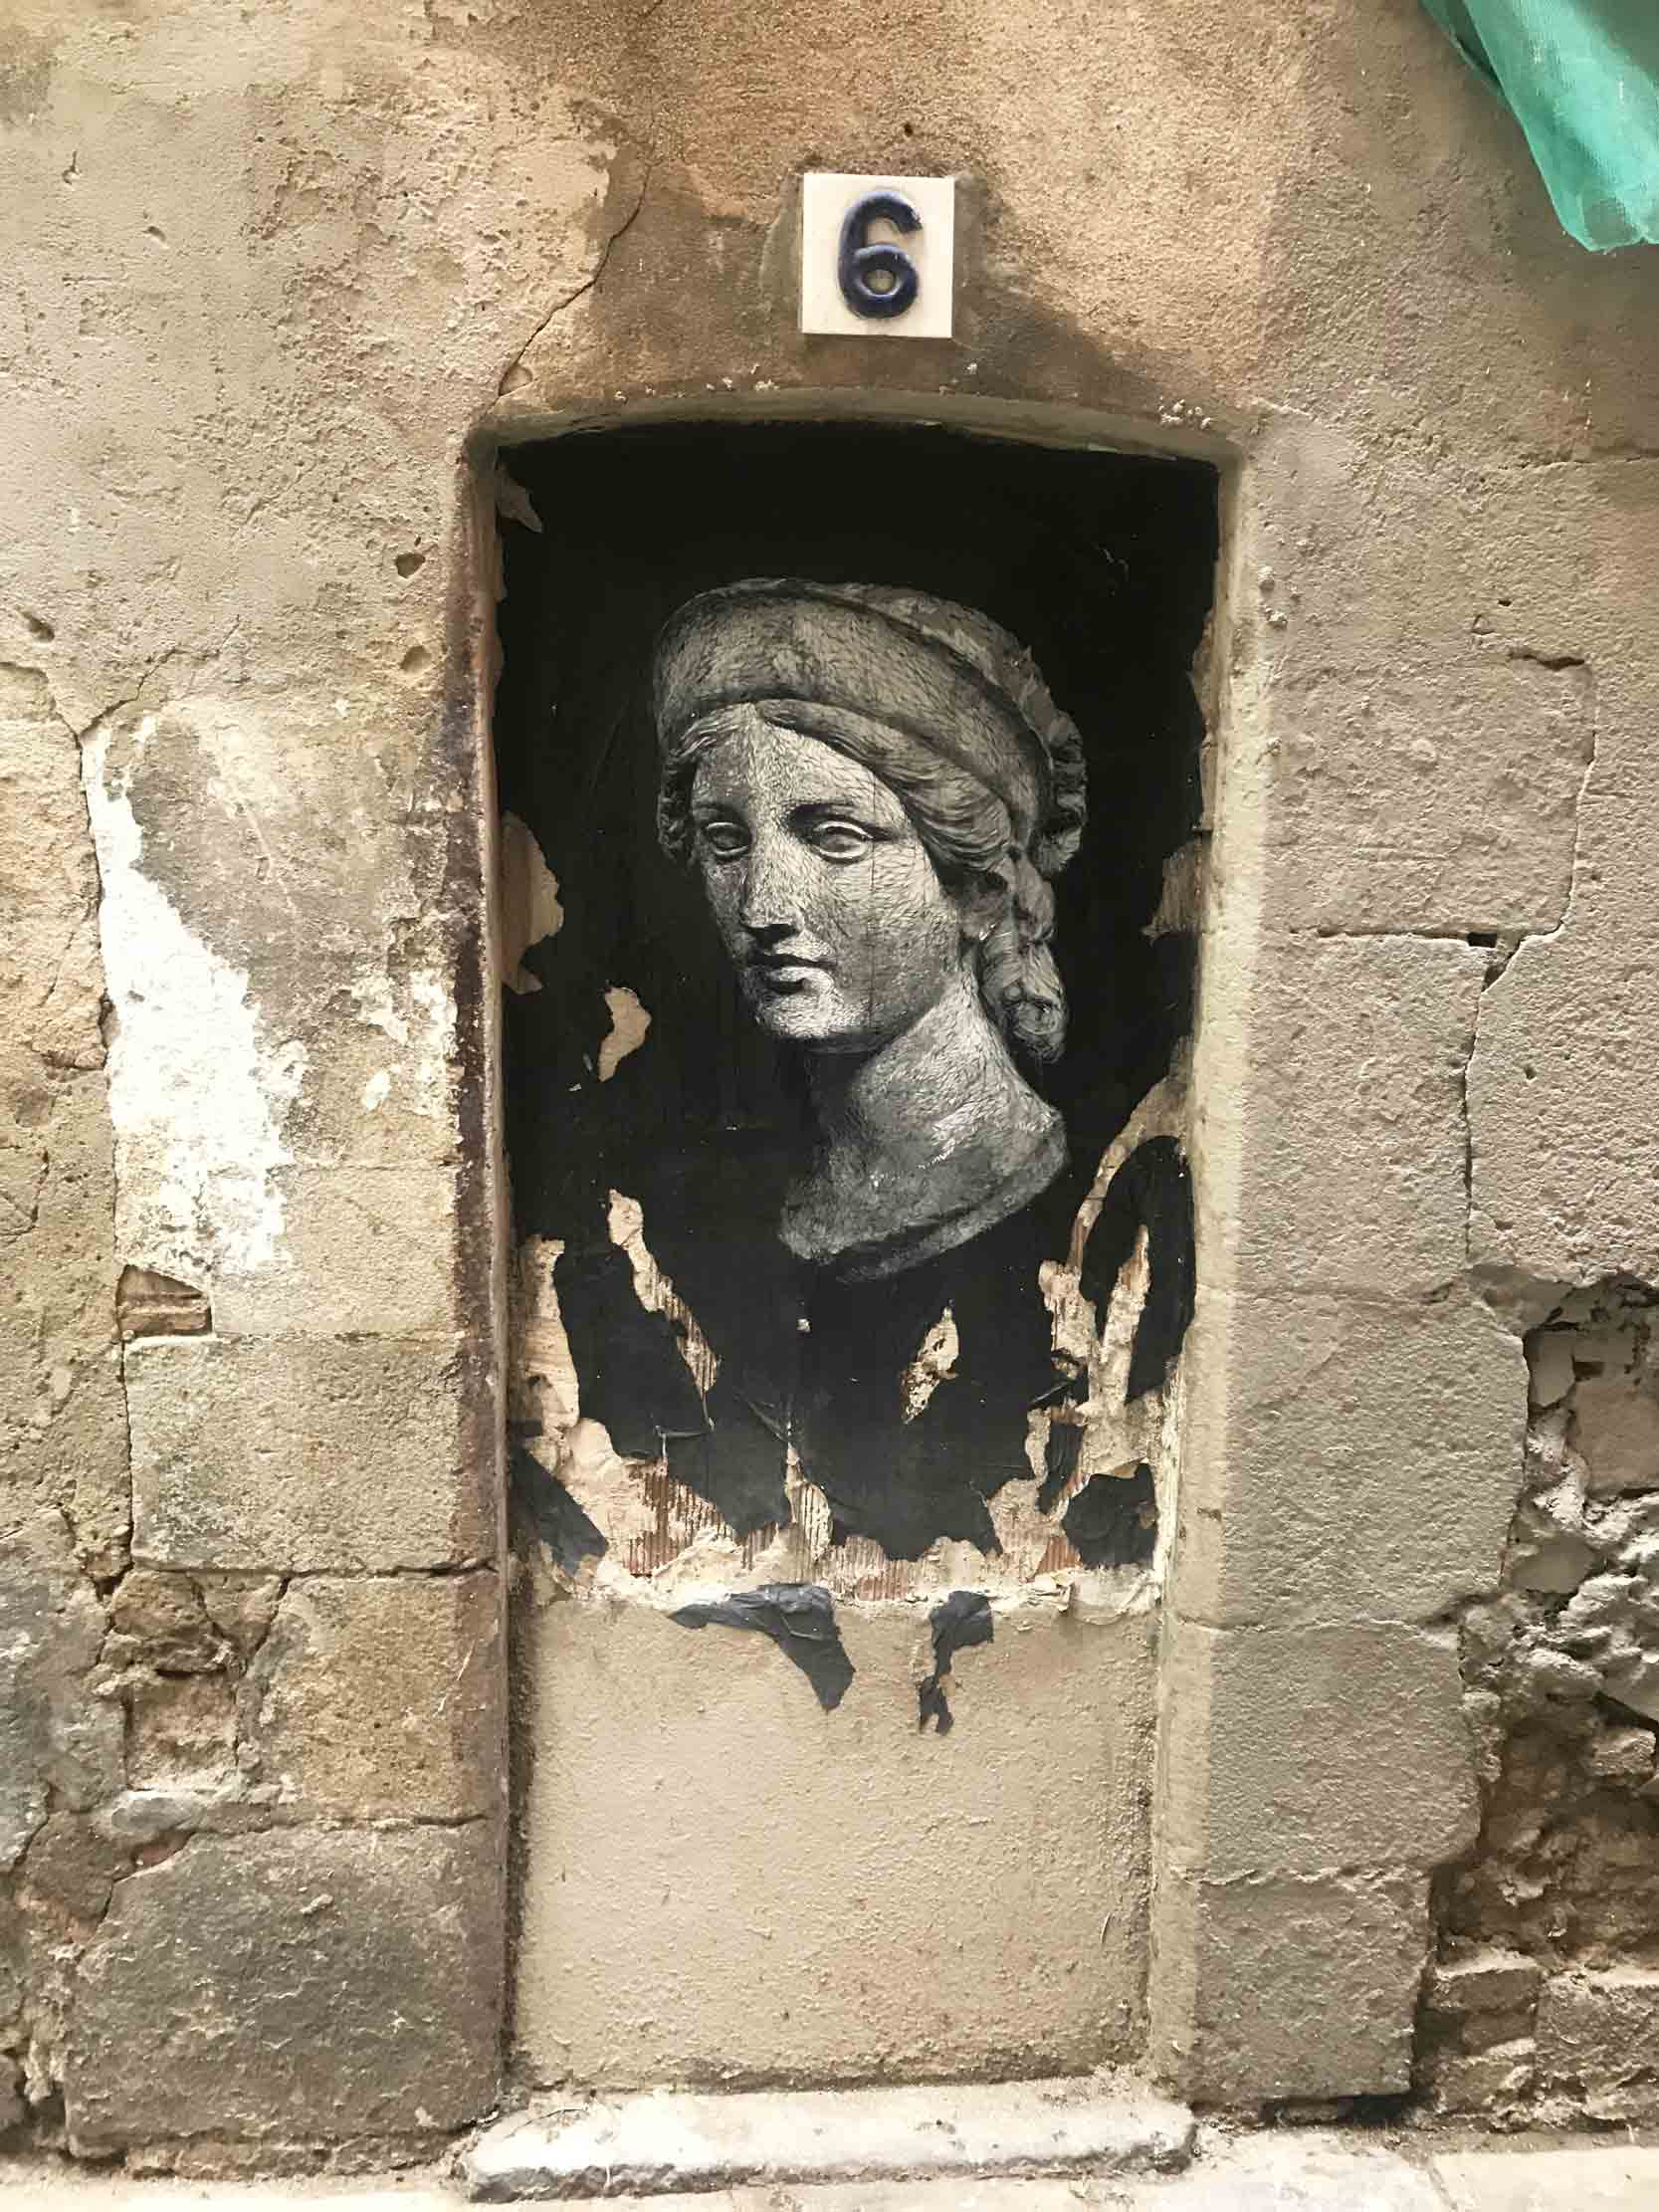 arte urbano Nasti 404 paste up barcelona